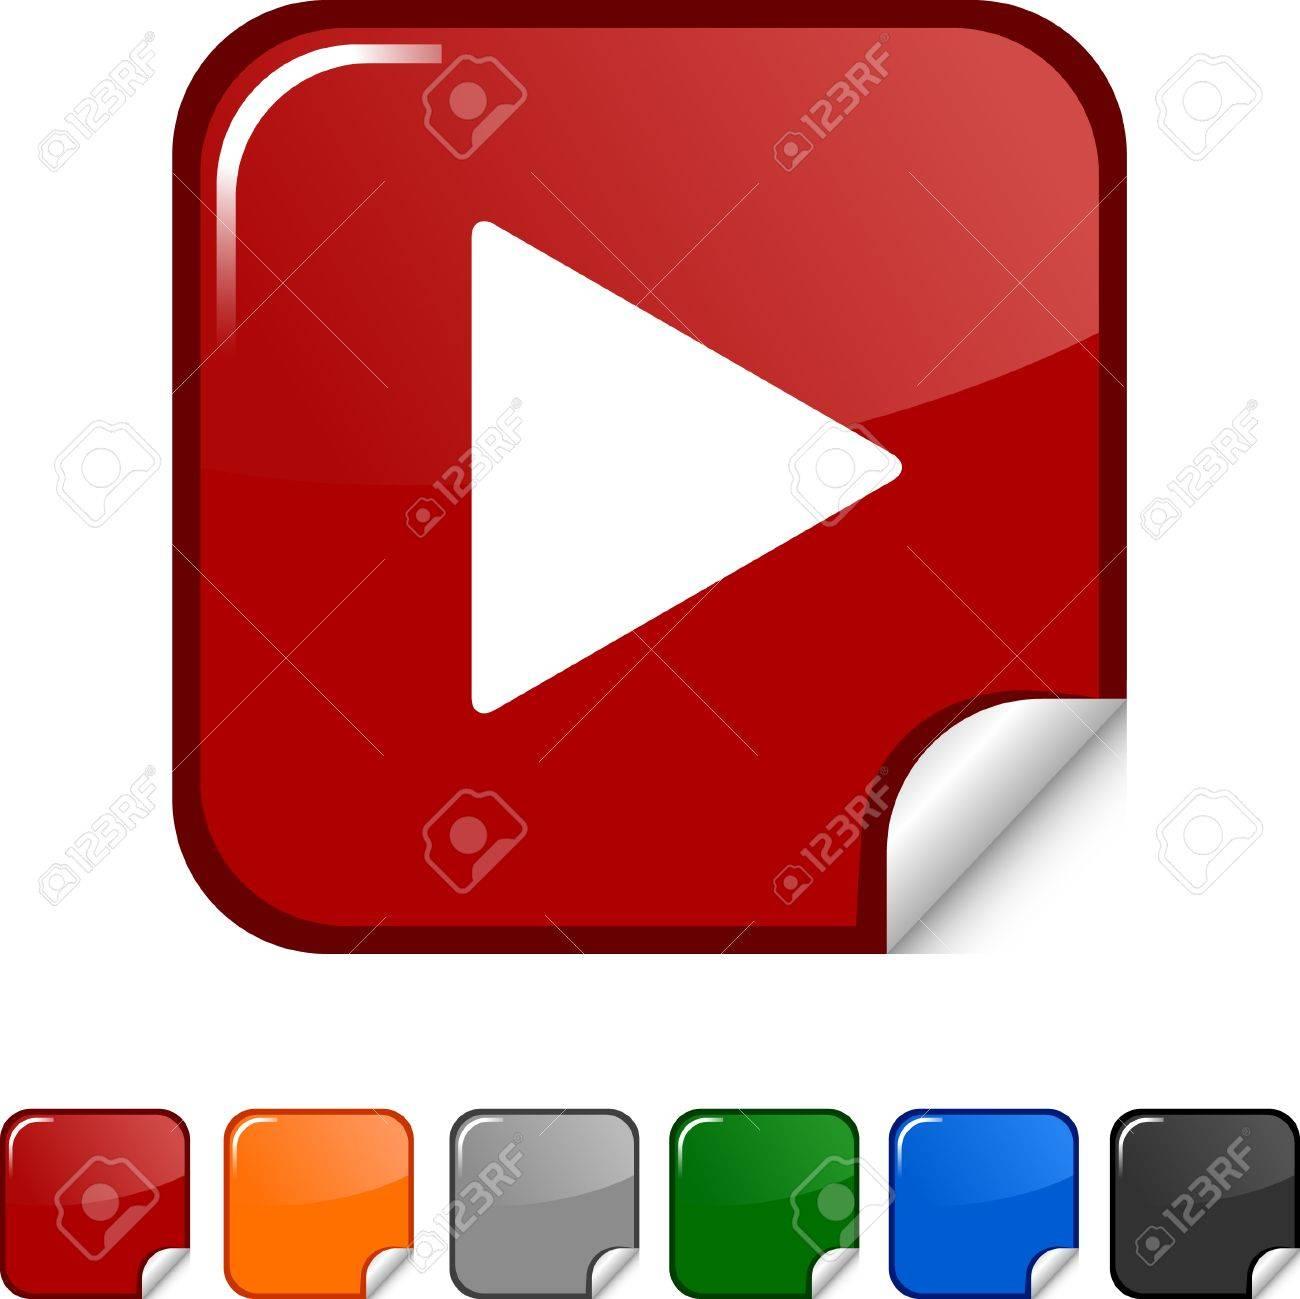 Play sticker icon. Vector illustration. Stock Vector - 5623014